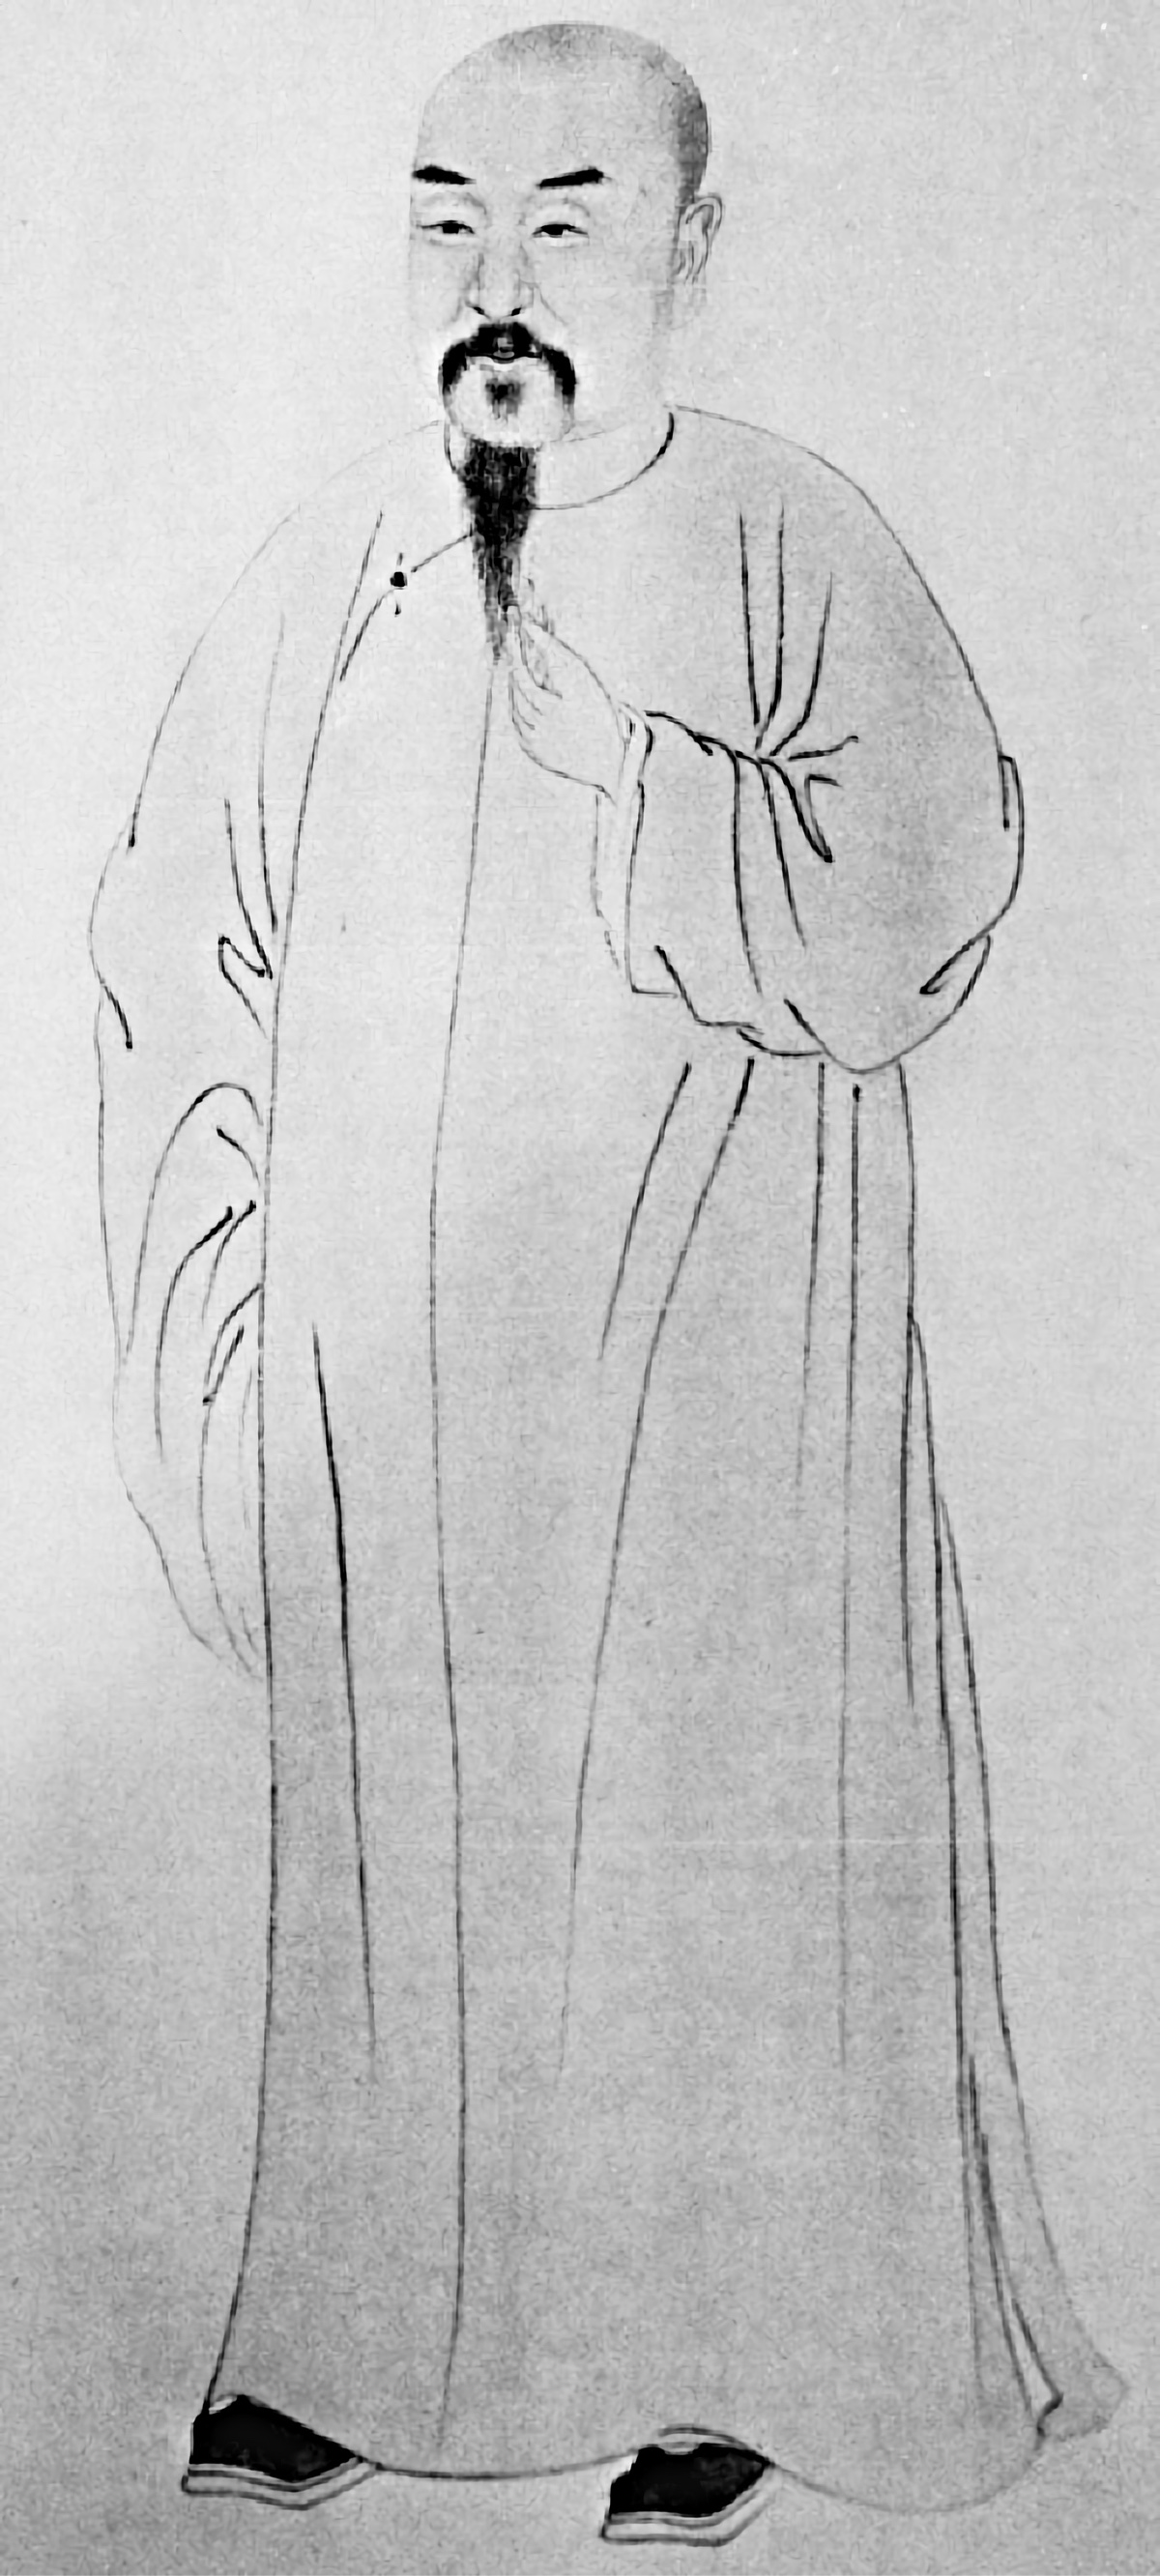 Chen Wenshu